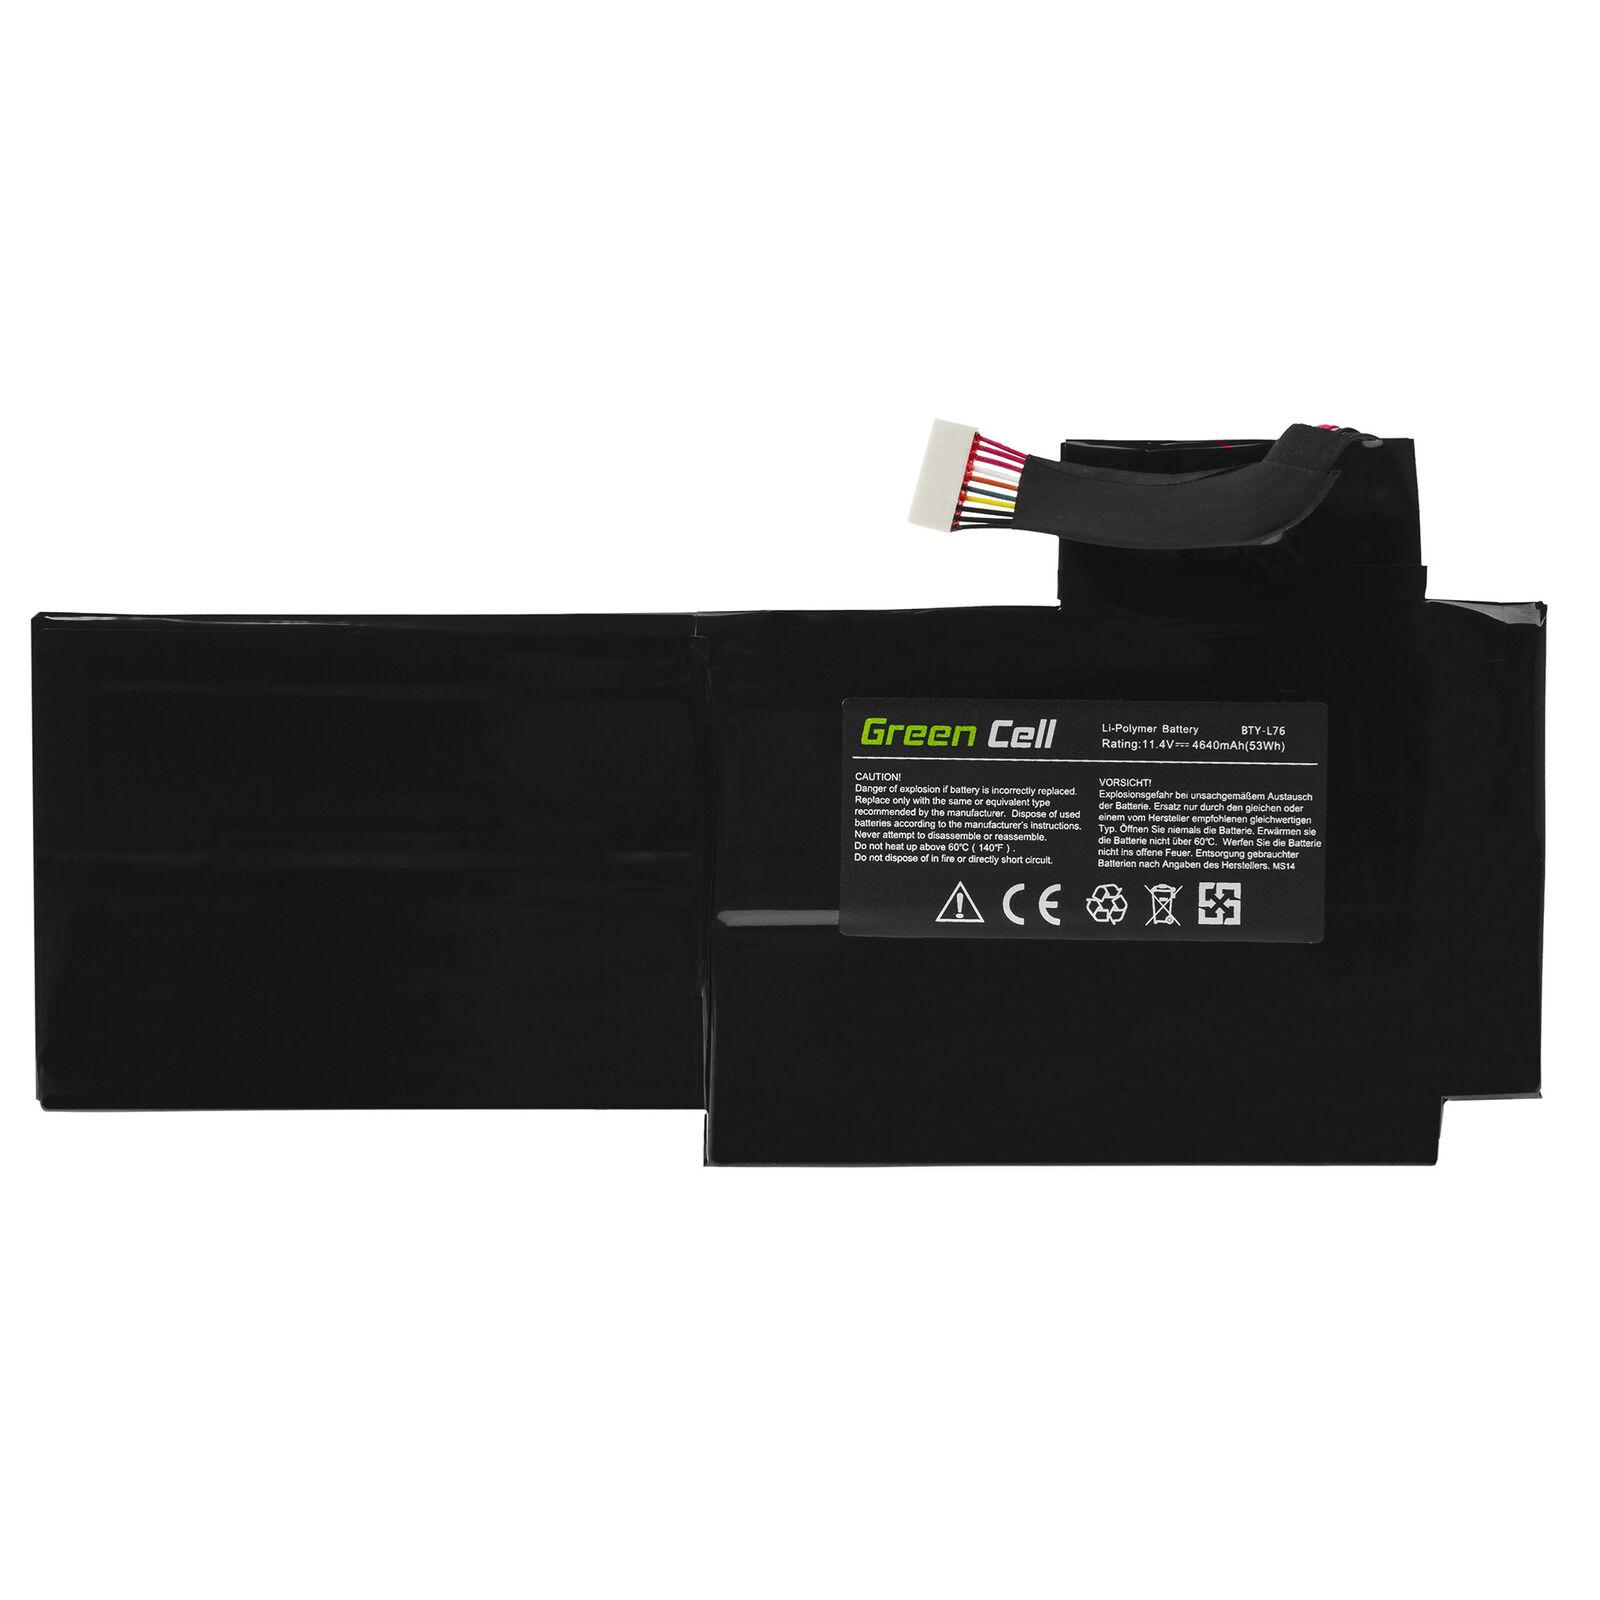 Akku für MSI GS70 GS60 WS60 PE60 MS-1771 XMG C703 GS72 BTY-L76(Ersatz)